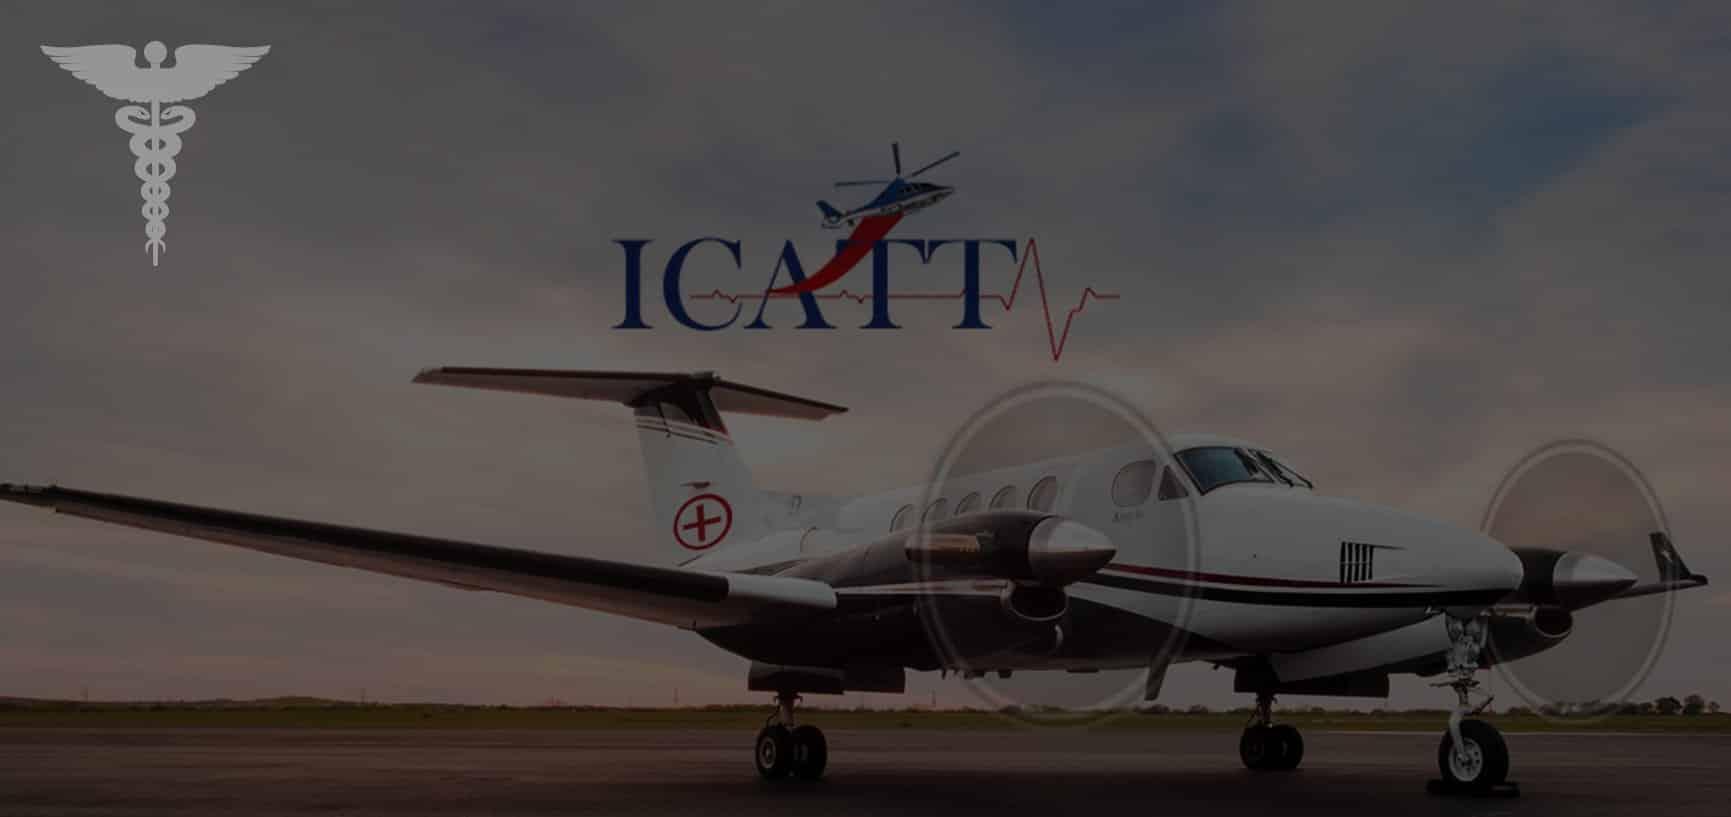 Best Air Ambulance Services in Hyderabad